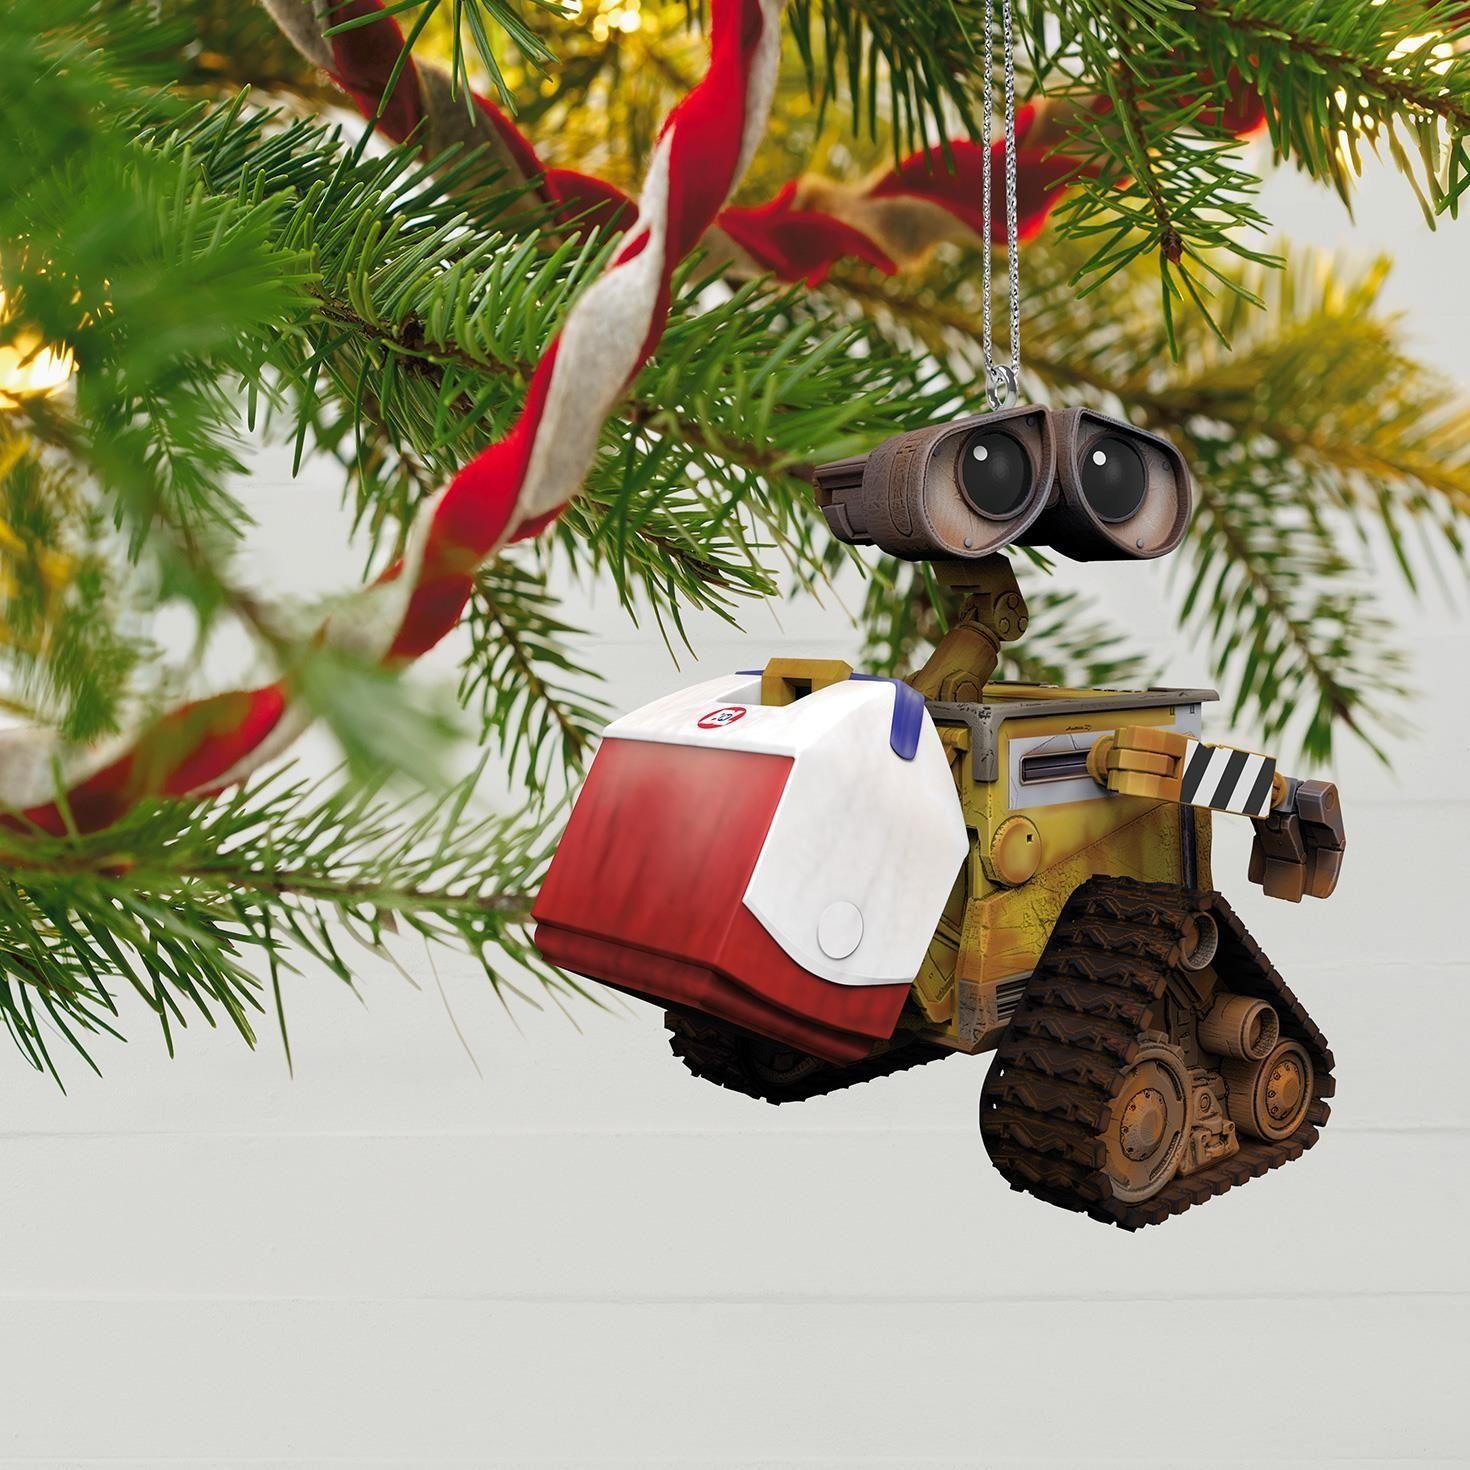 Hallmark Keepsake Disney Pixar WALL-E 10th Anniversary Ornament